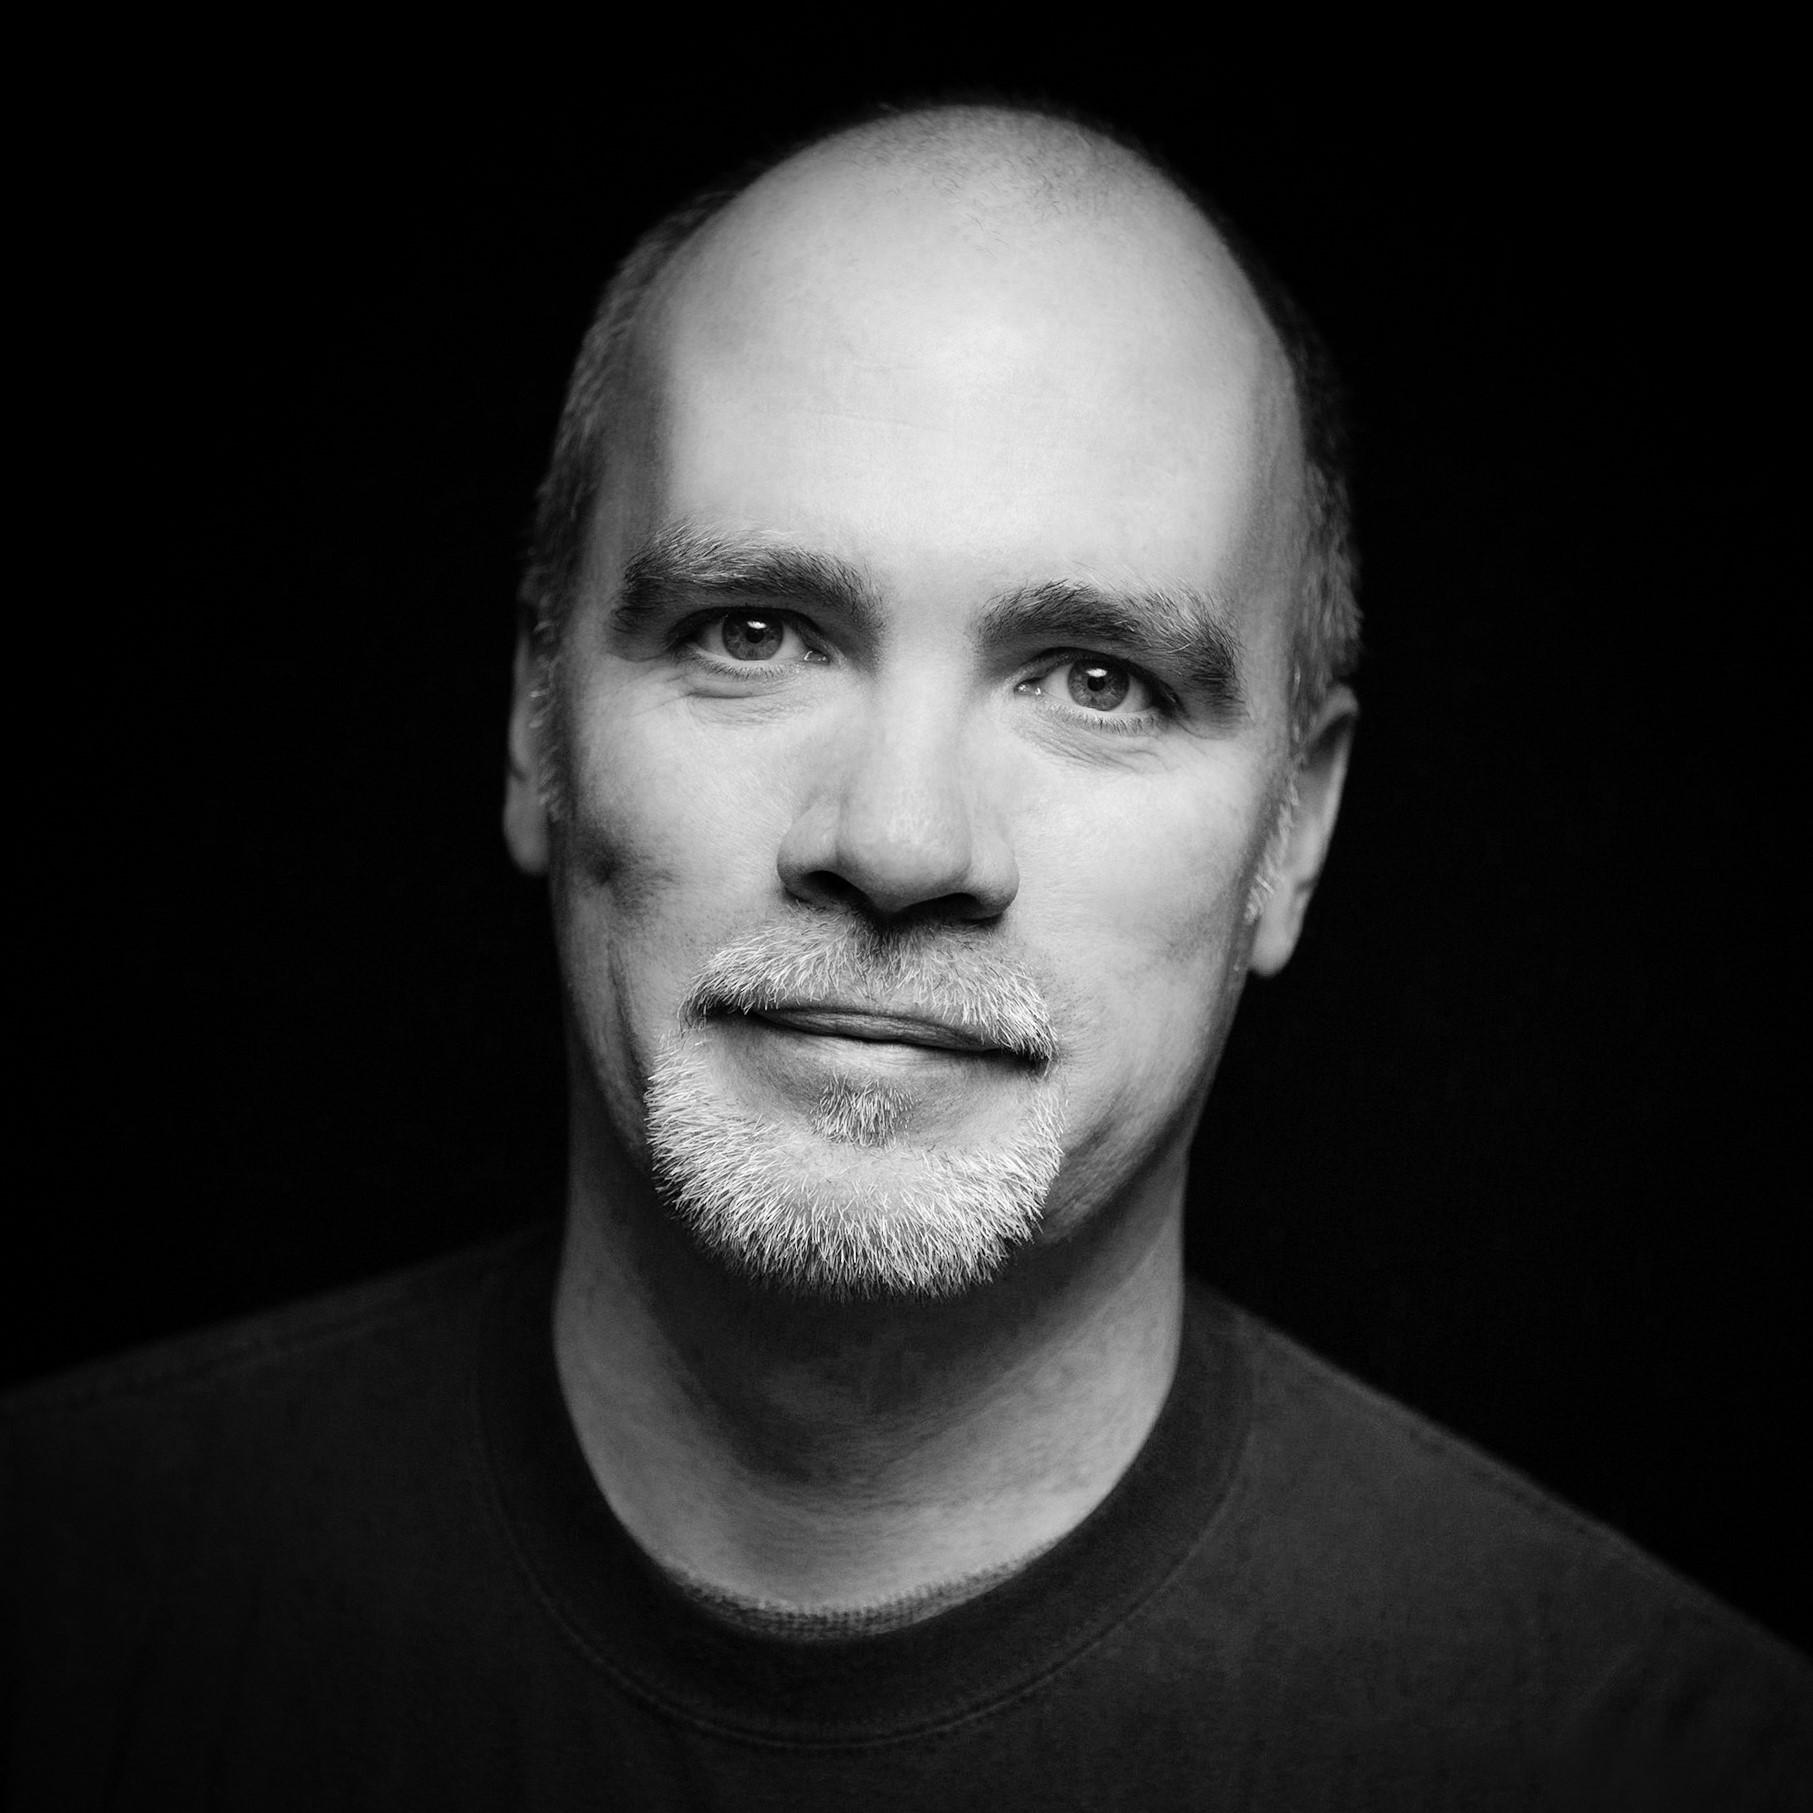 Patrick-Saunders-Headshot-BandW.jpg